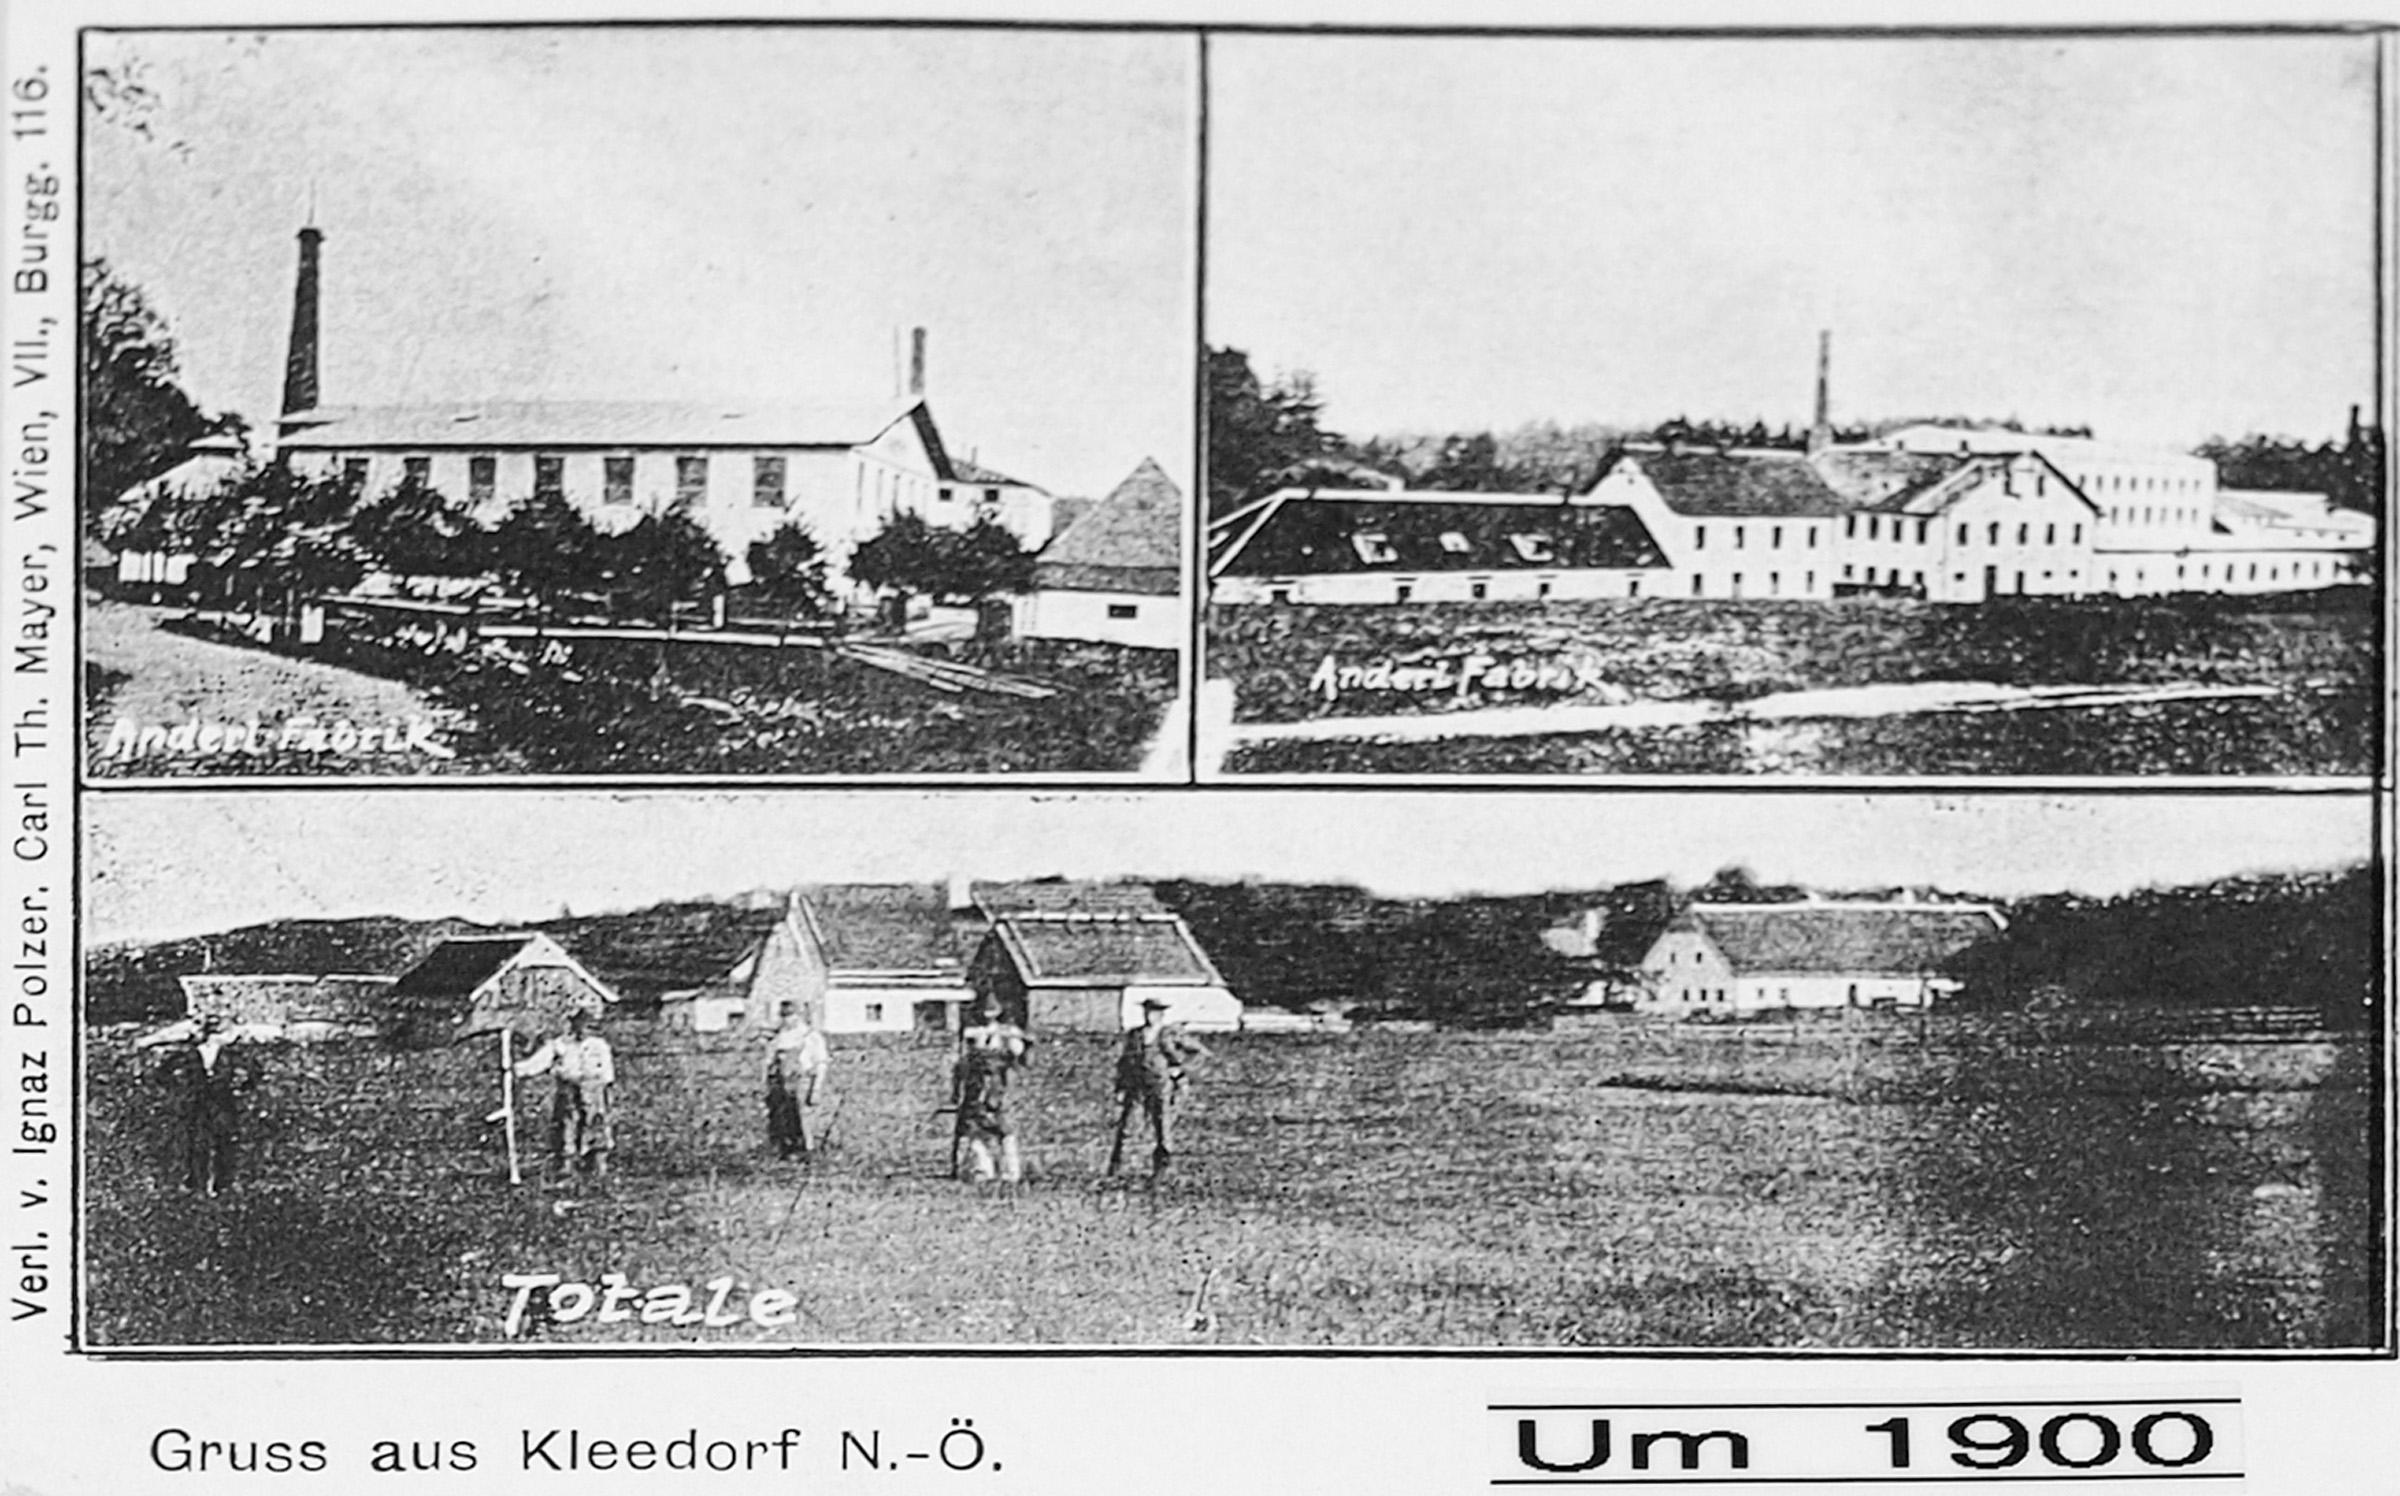 Anderlfabrik 1910 Schrems.jpg